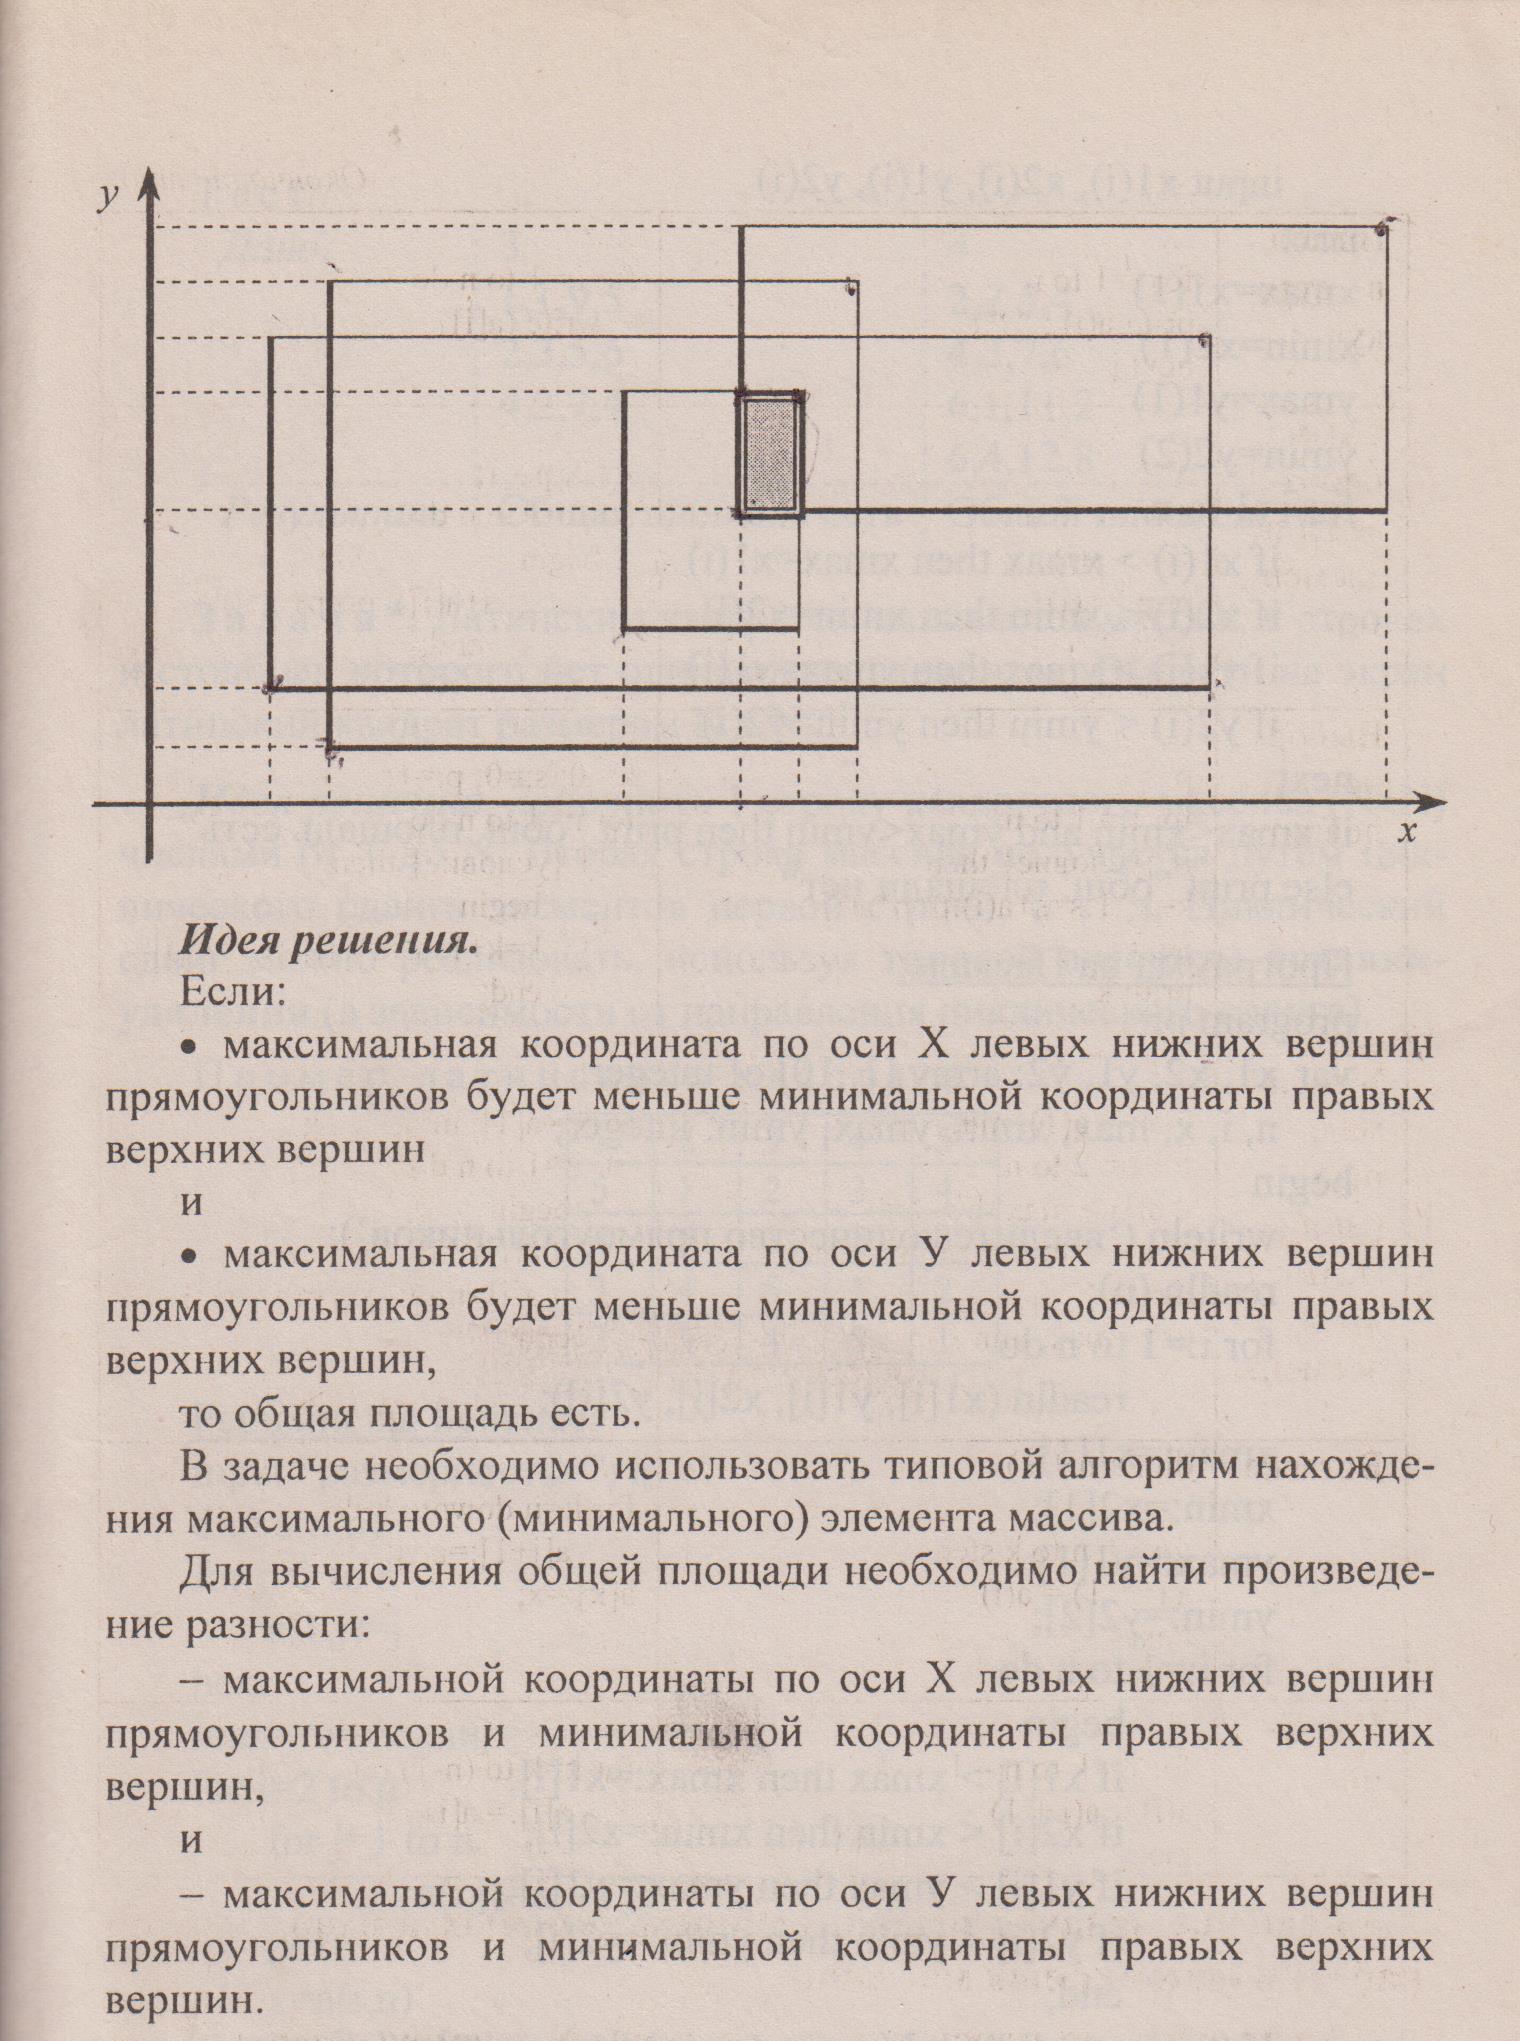 C:\Users\Татьяна\Pictures\2014-01-28\001.jpg